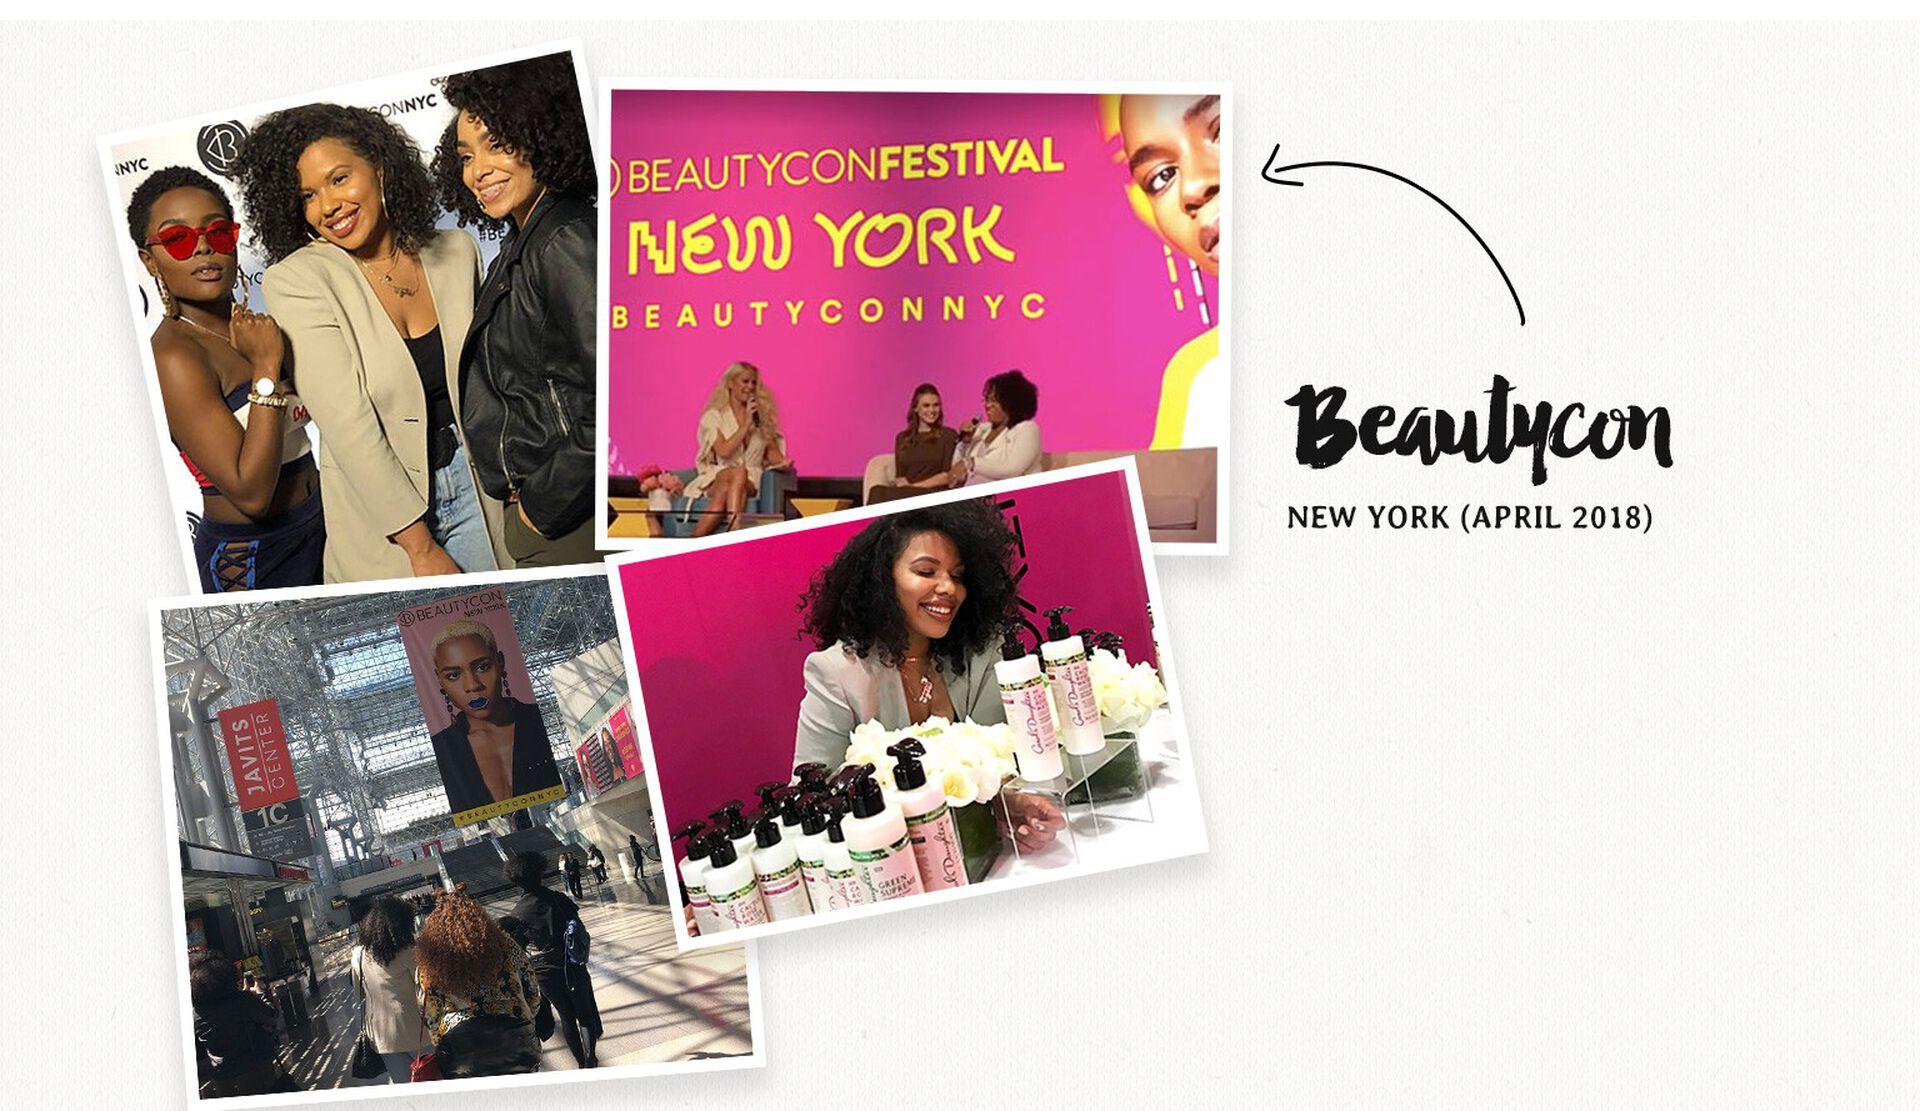 Beautycon. New York. April 2018.